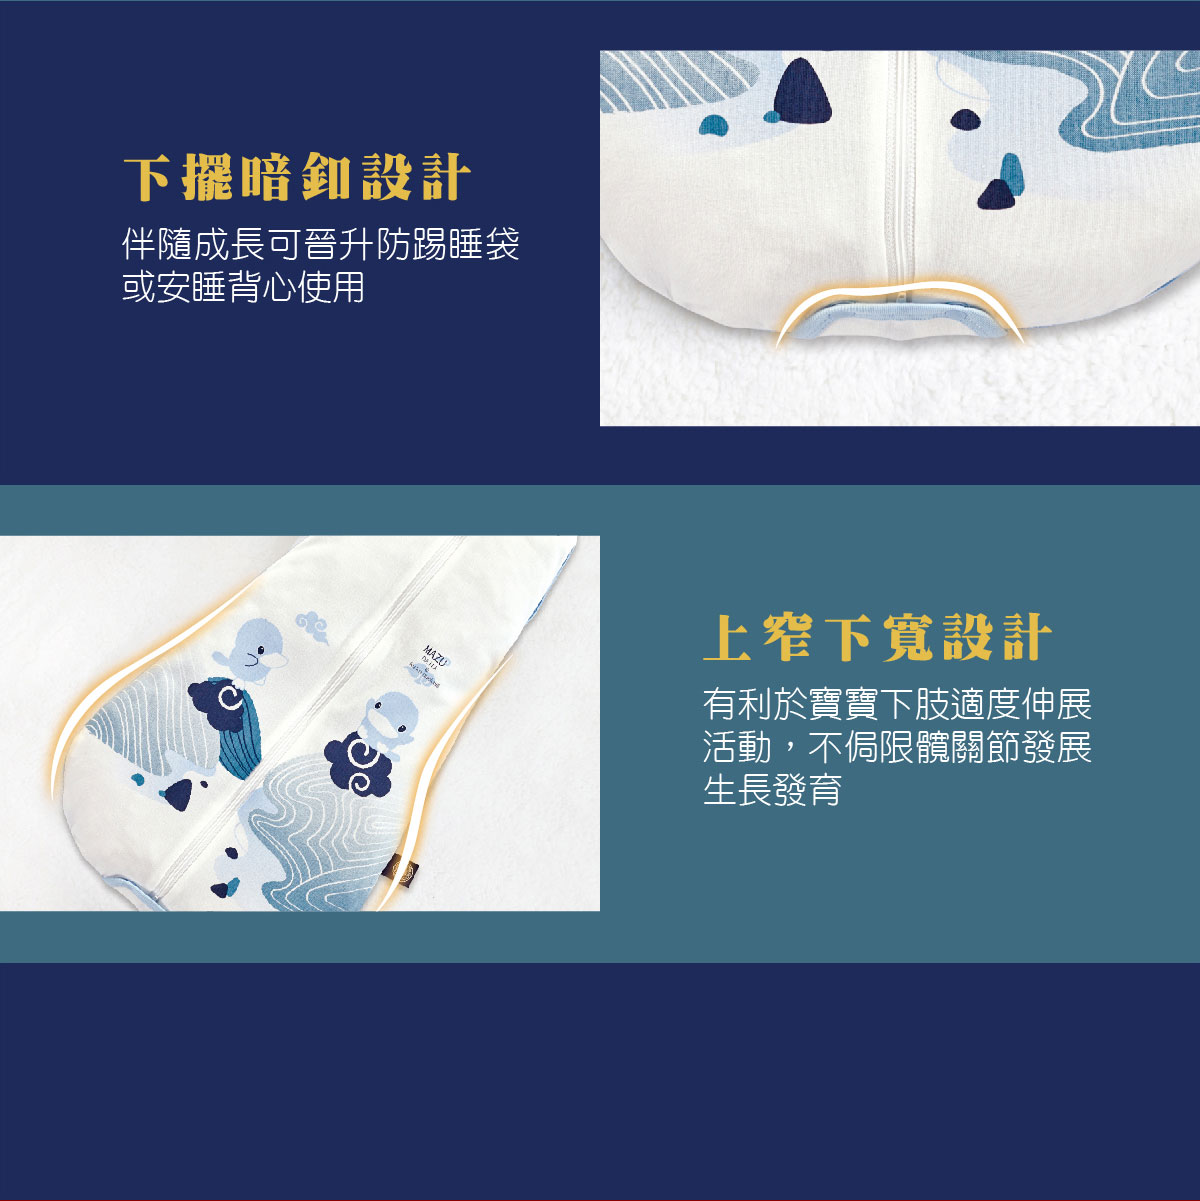 proimages/BeddingSeries/Blankets-Comforter/2542/大甲媽成長包巾-EDM-08.jpg